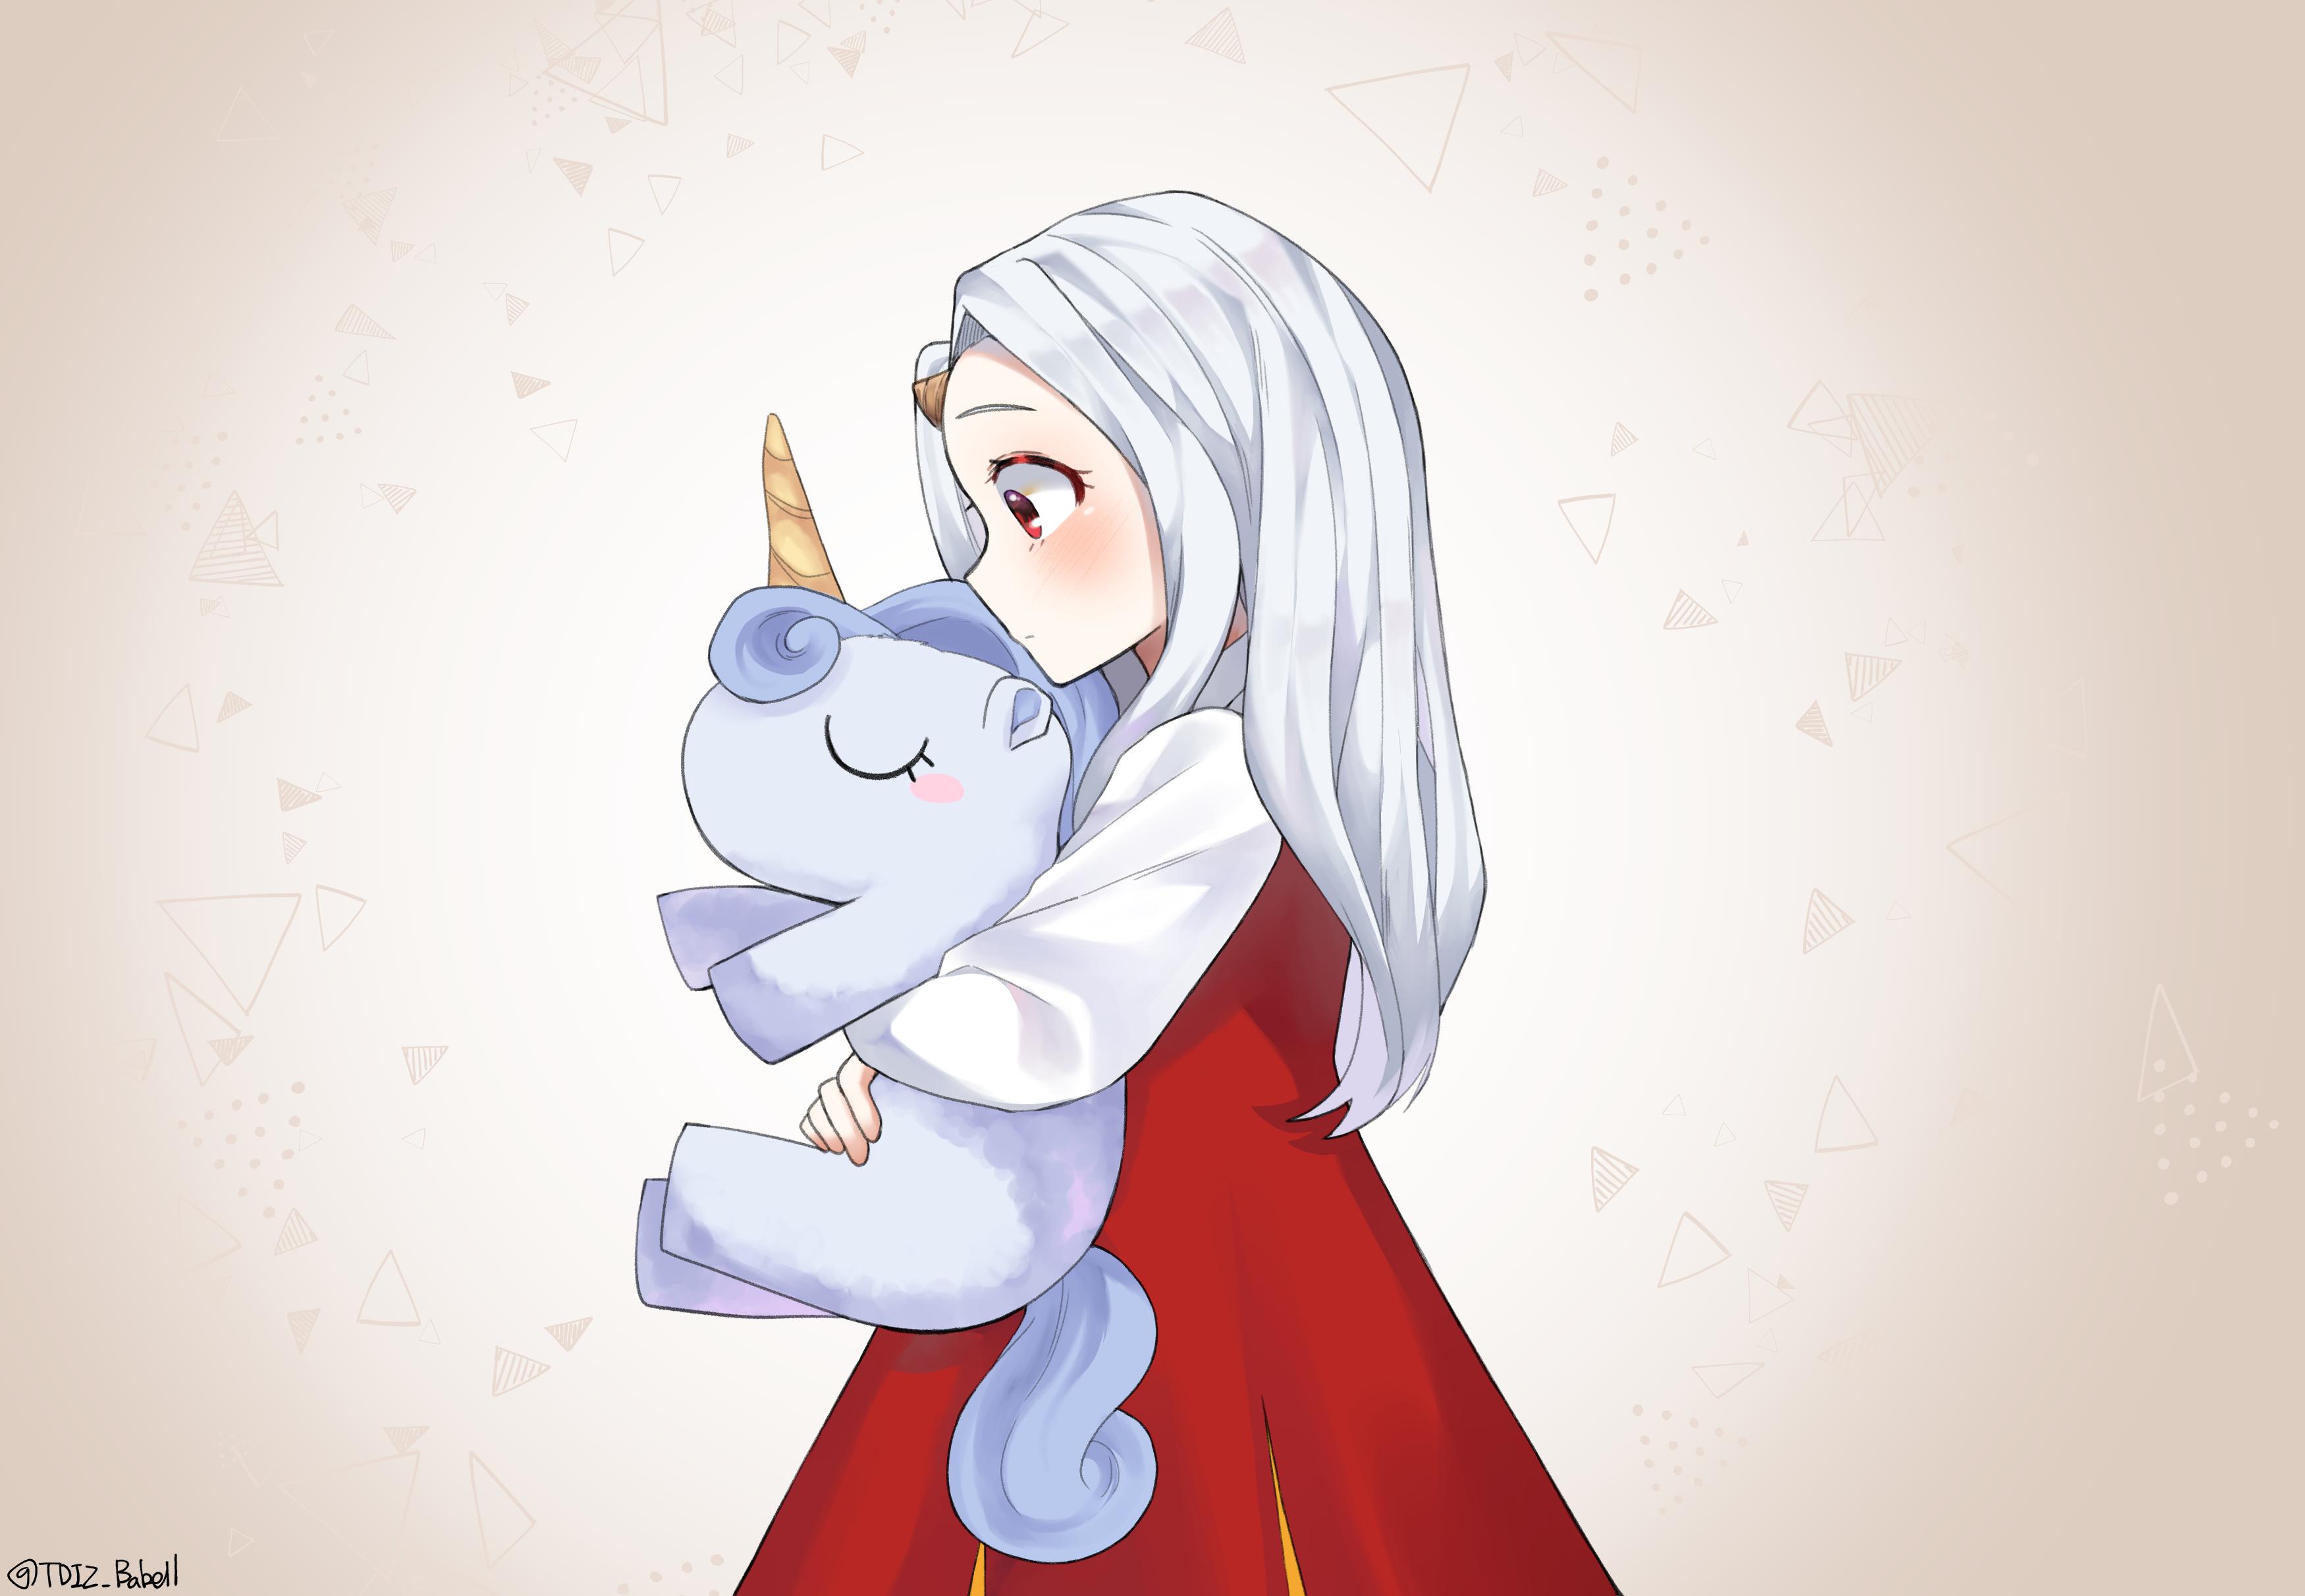 Eri With Her Unicorn My Hero Academia Know Your Meme #eri #эри #сущиймик #presentmic #aizawashouta показать полностью. eri with her unicorn my hero academia